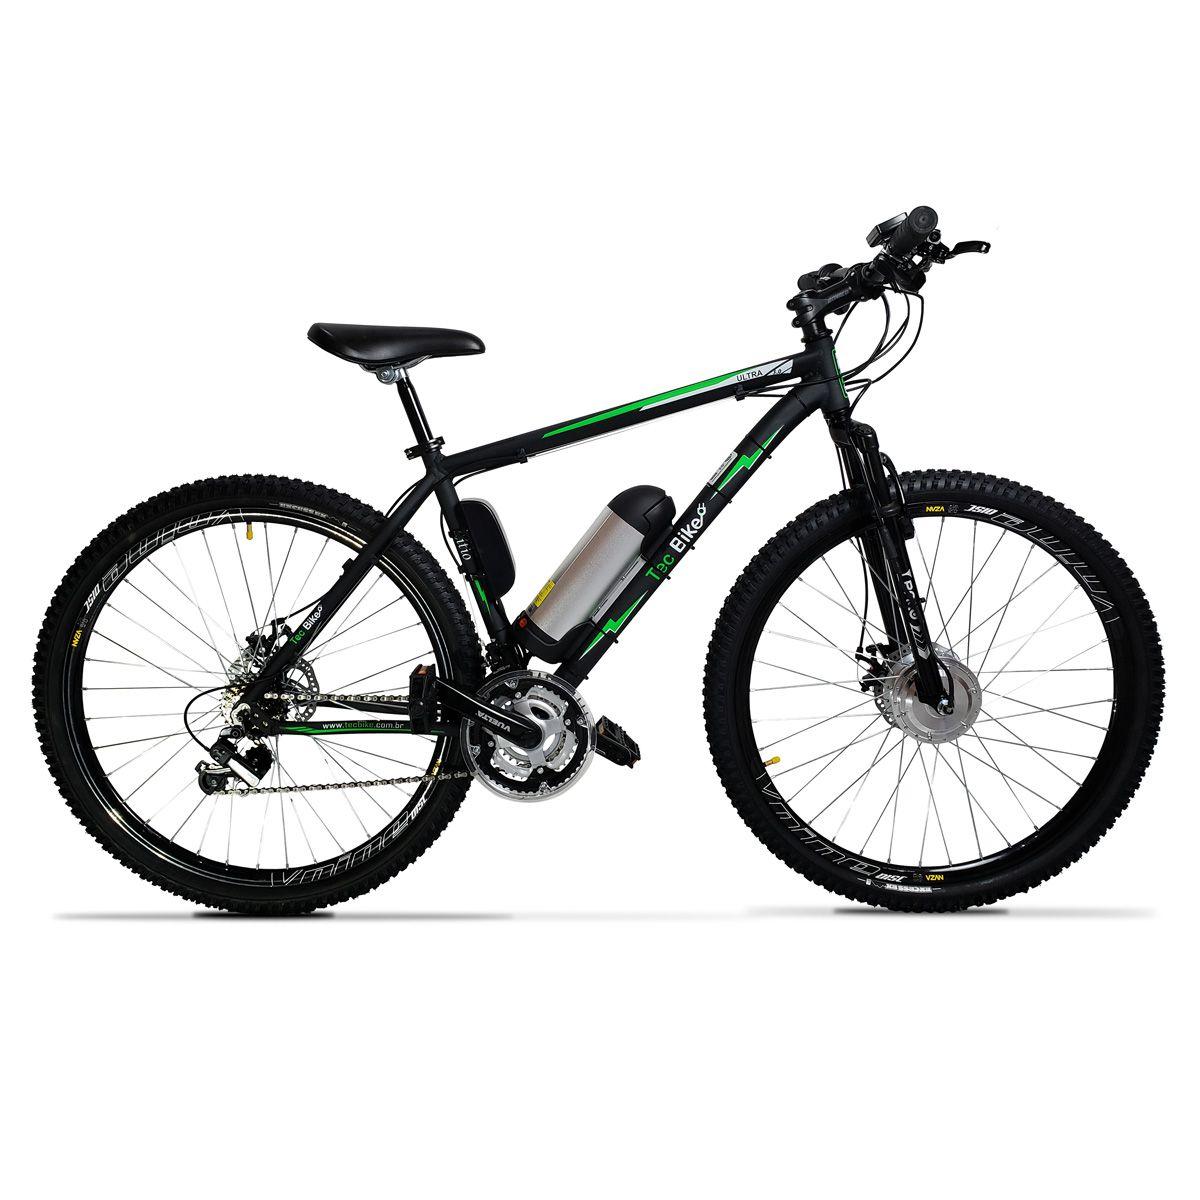 Bicicleta Elétrica Aro 29 Alumínio Bateria de Litio TecUltra 3.0